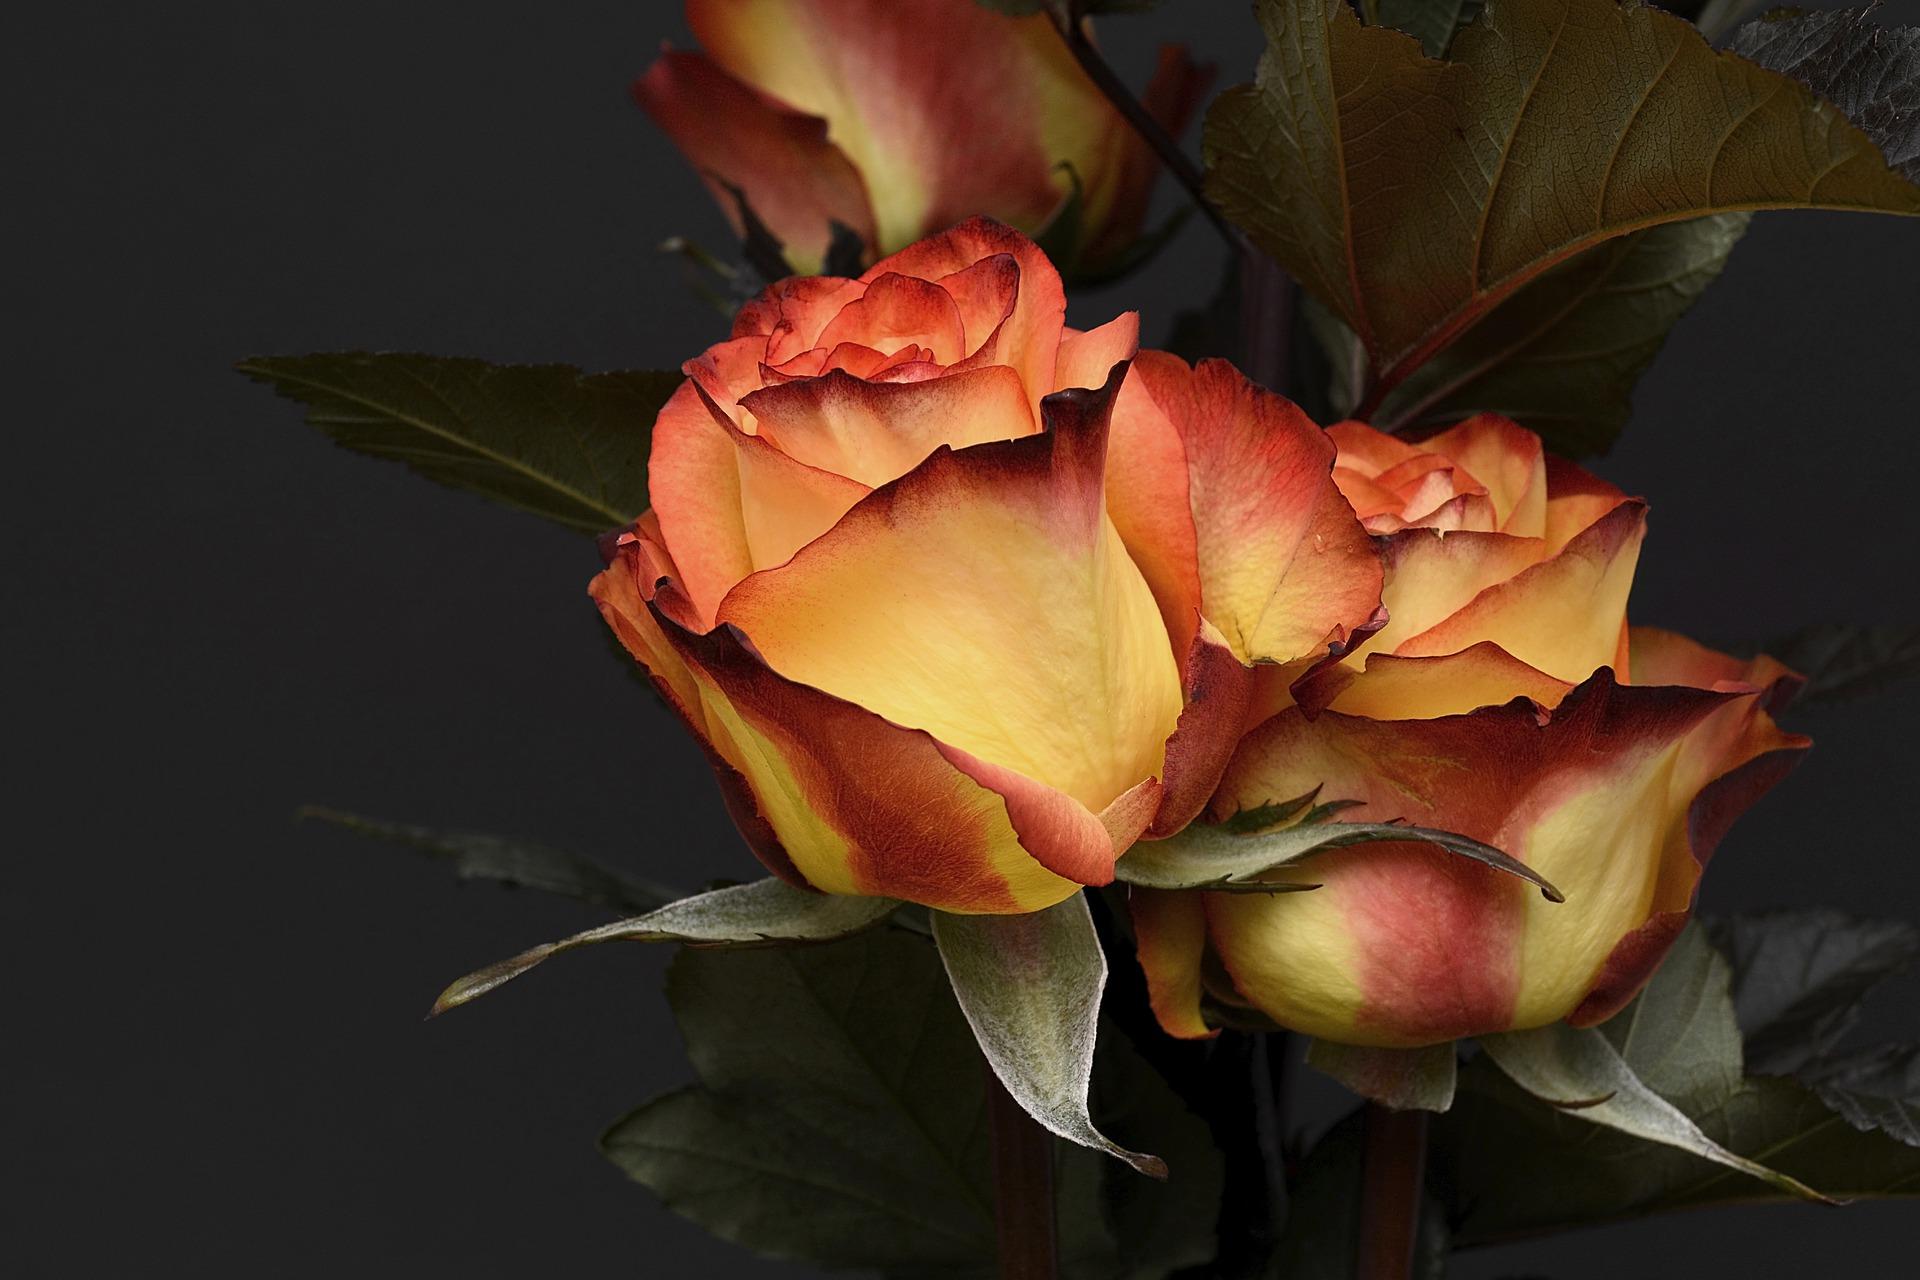 rose-3063284_1920_1518024204834.jpg flowers